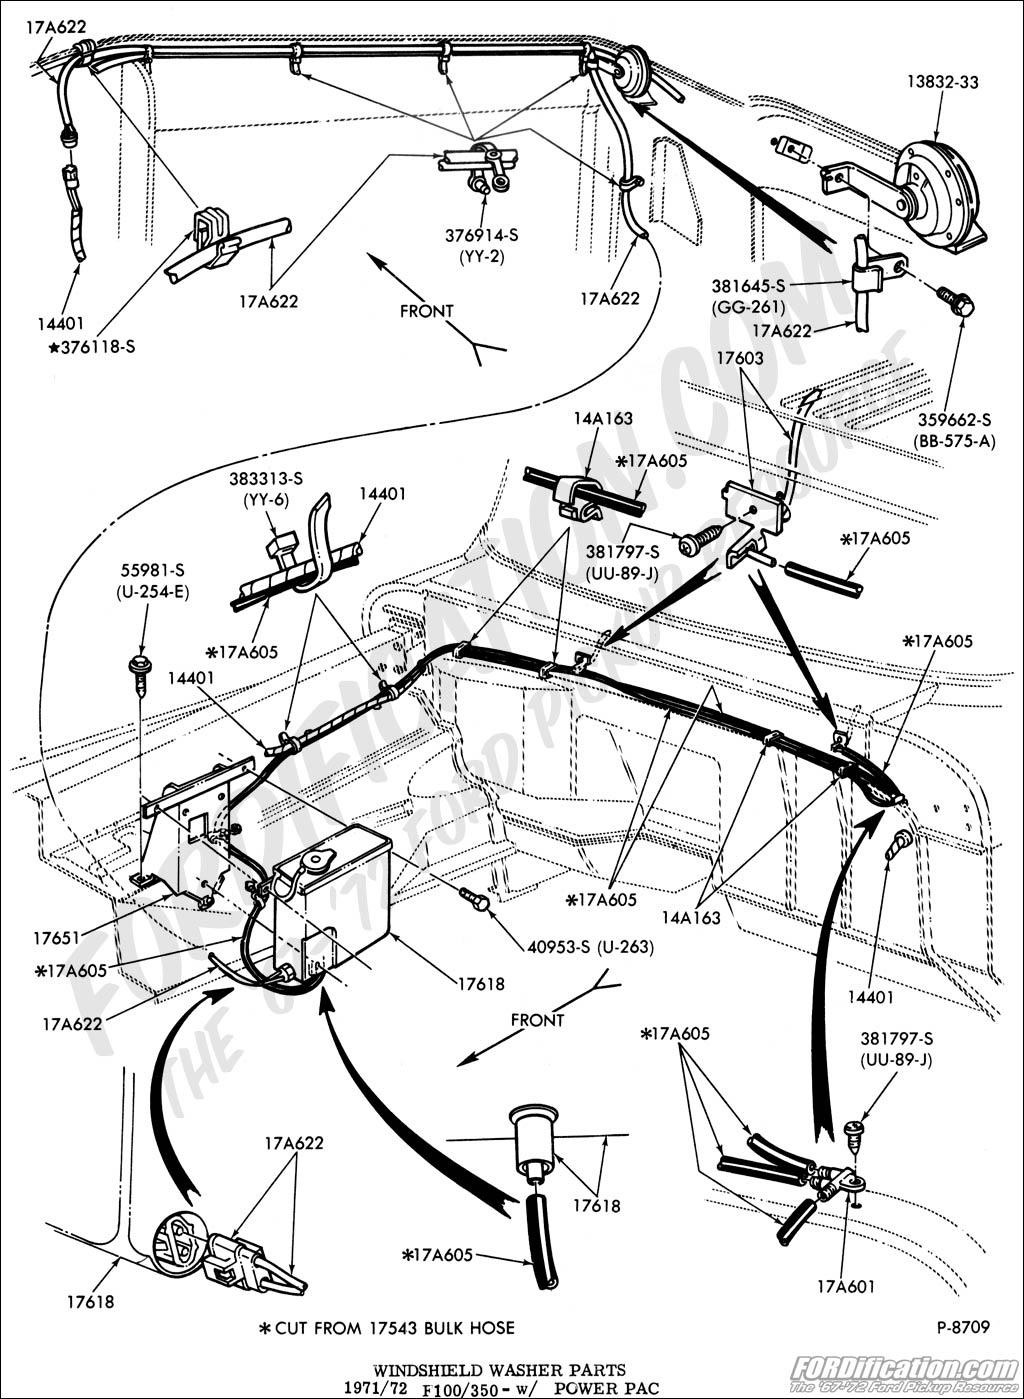 2001 Mustang Wiring Diagram Honda Civic Main Relay